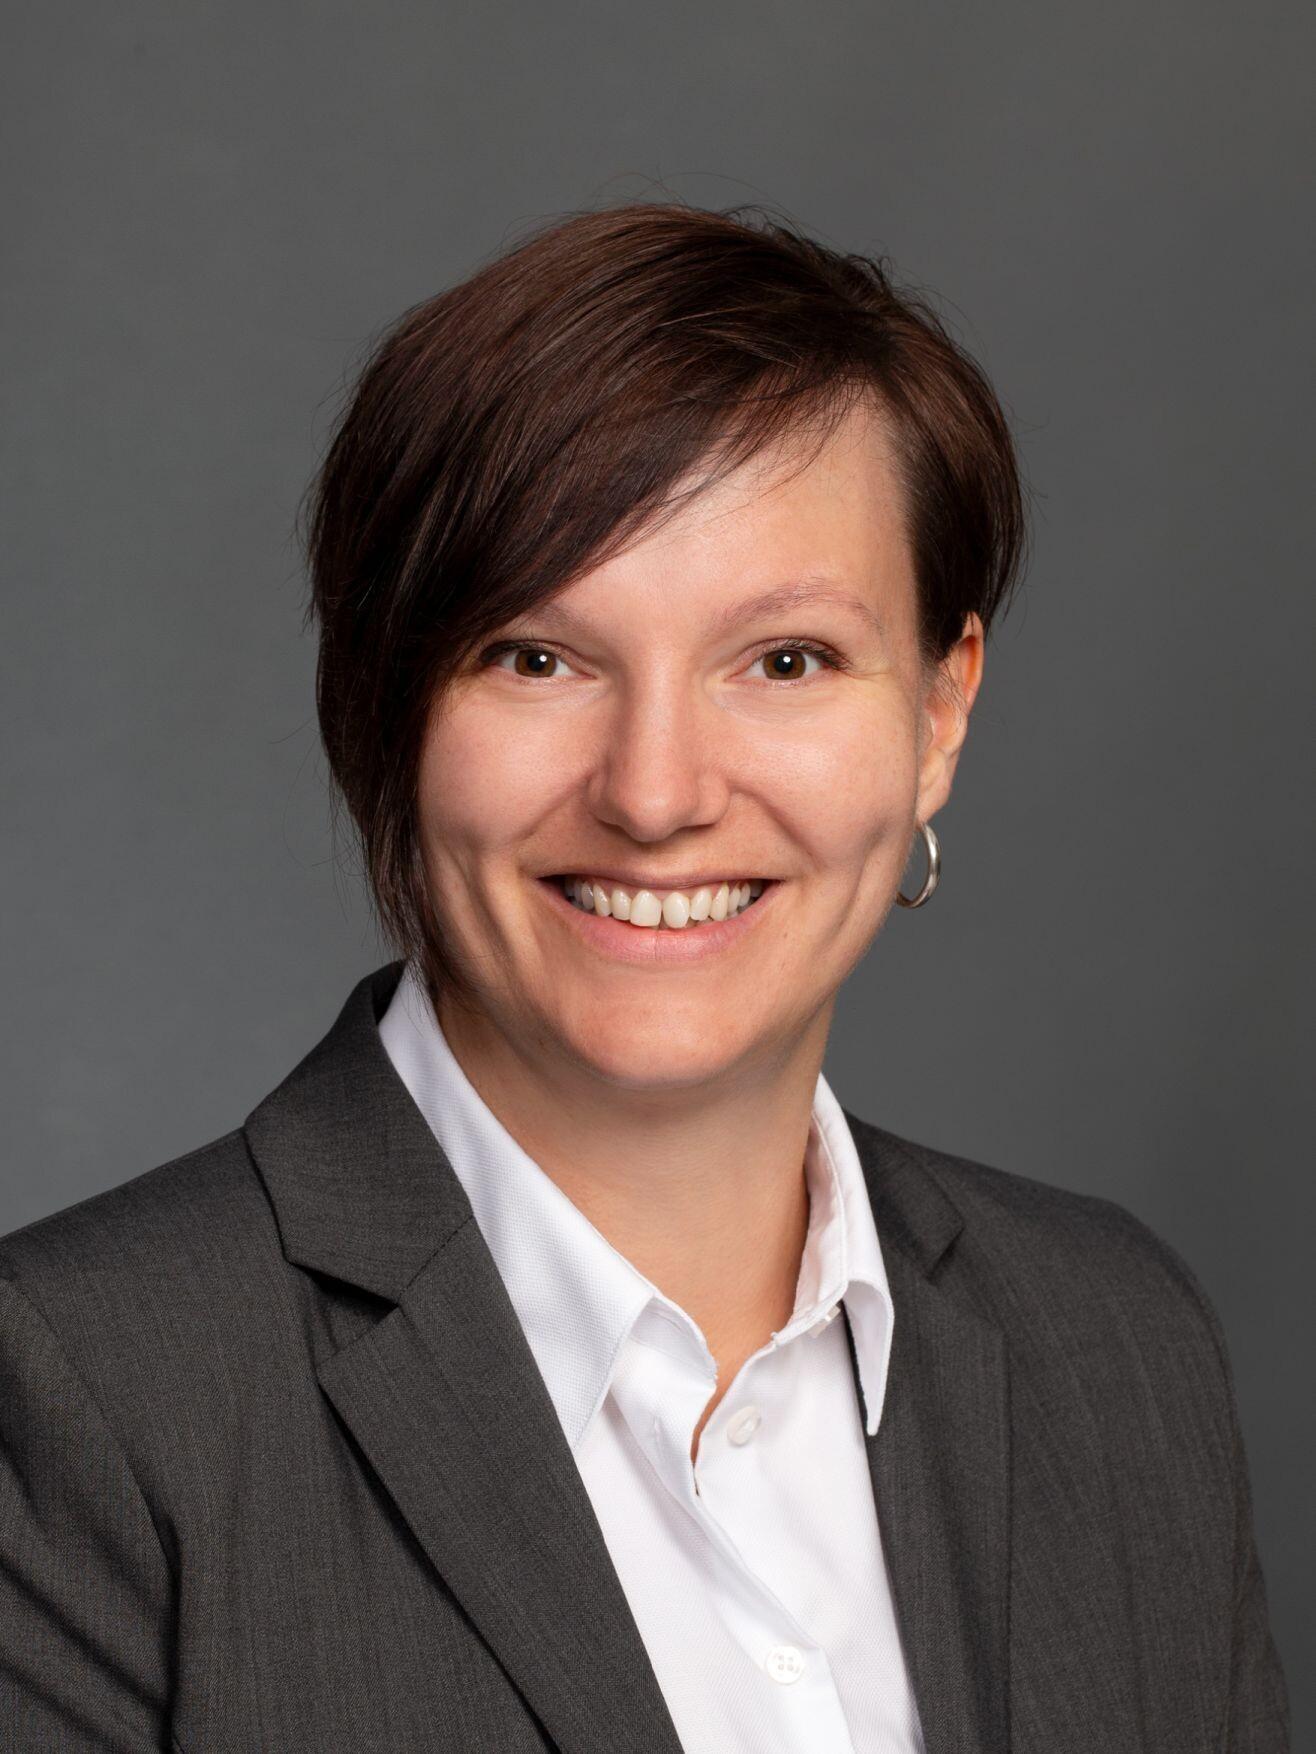 Pia Hovaldt Mathiassen